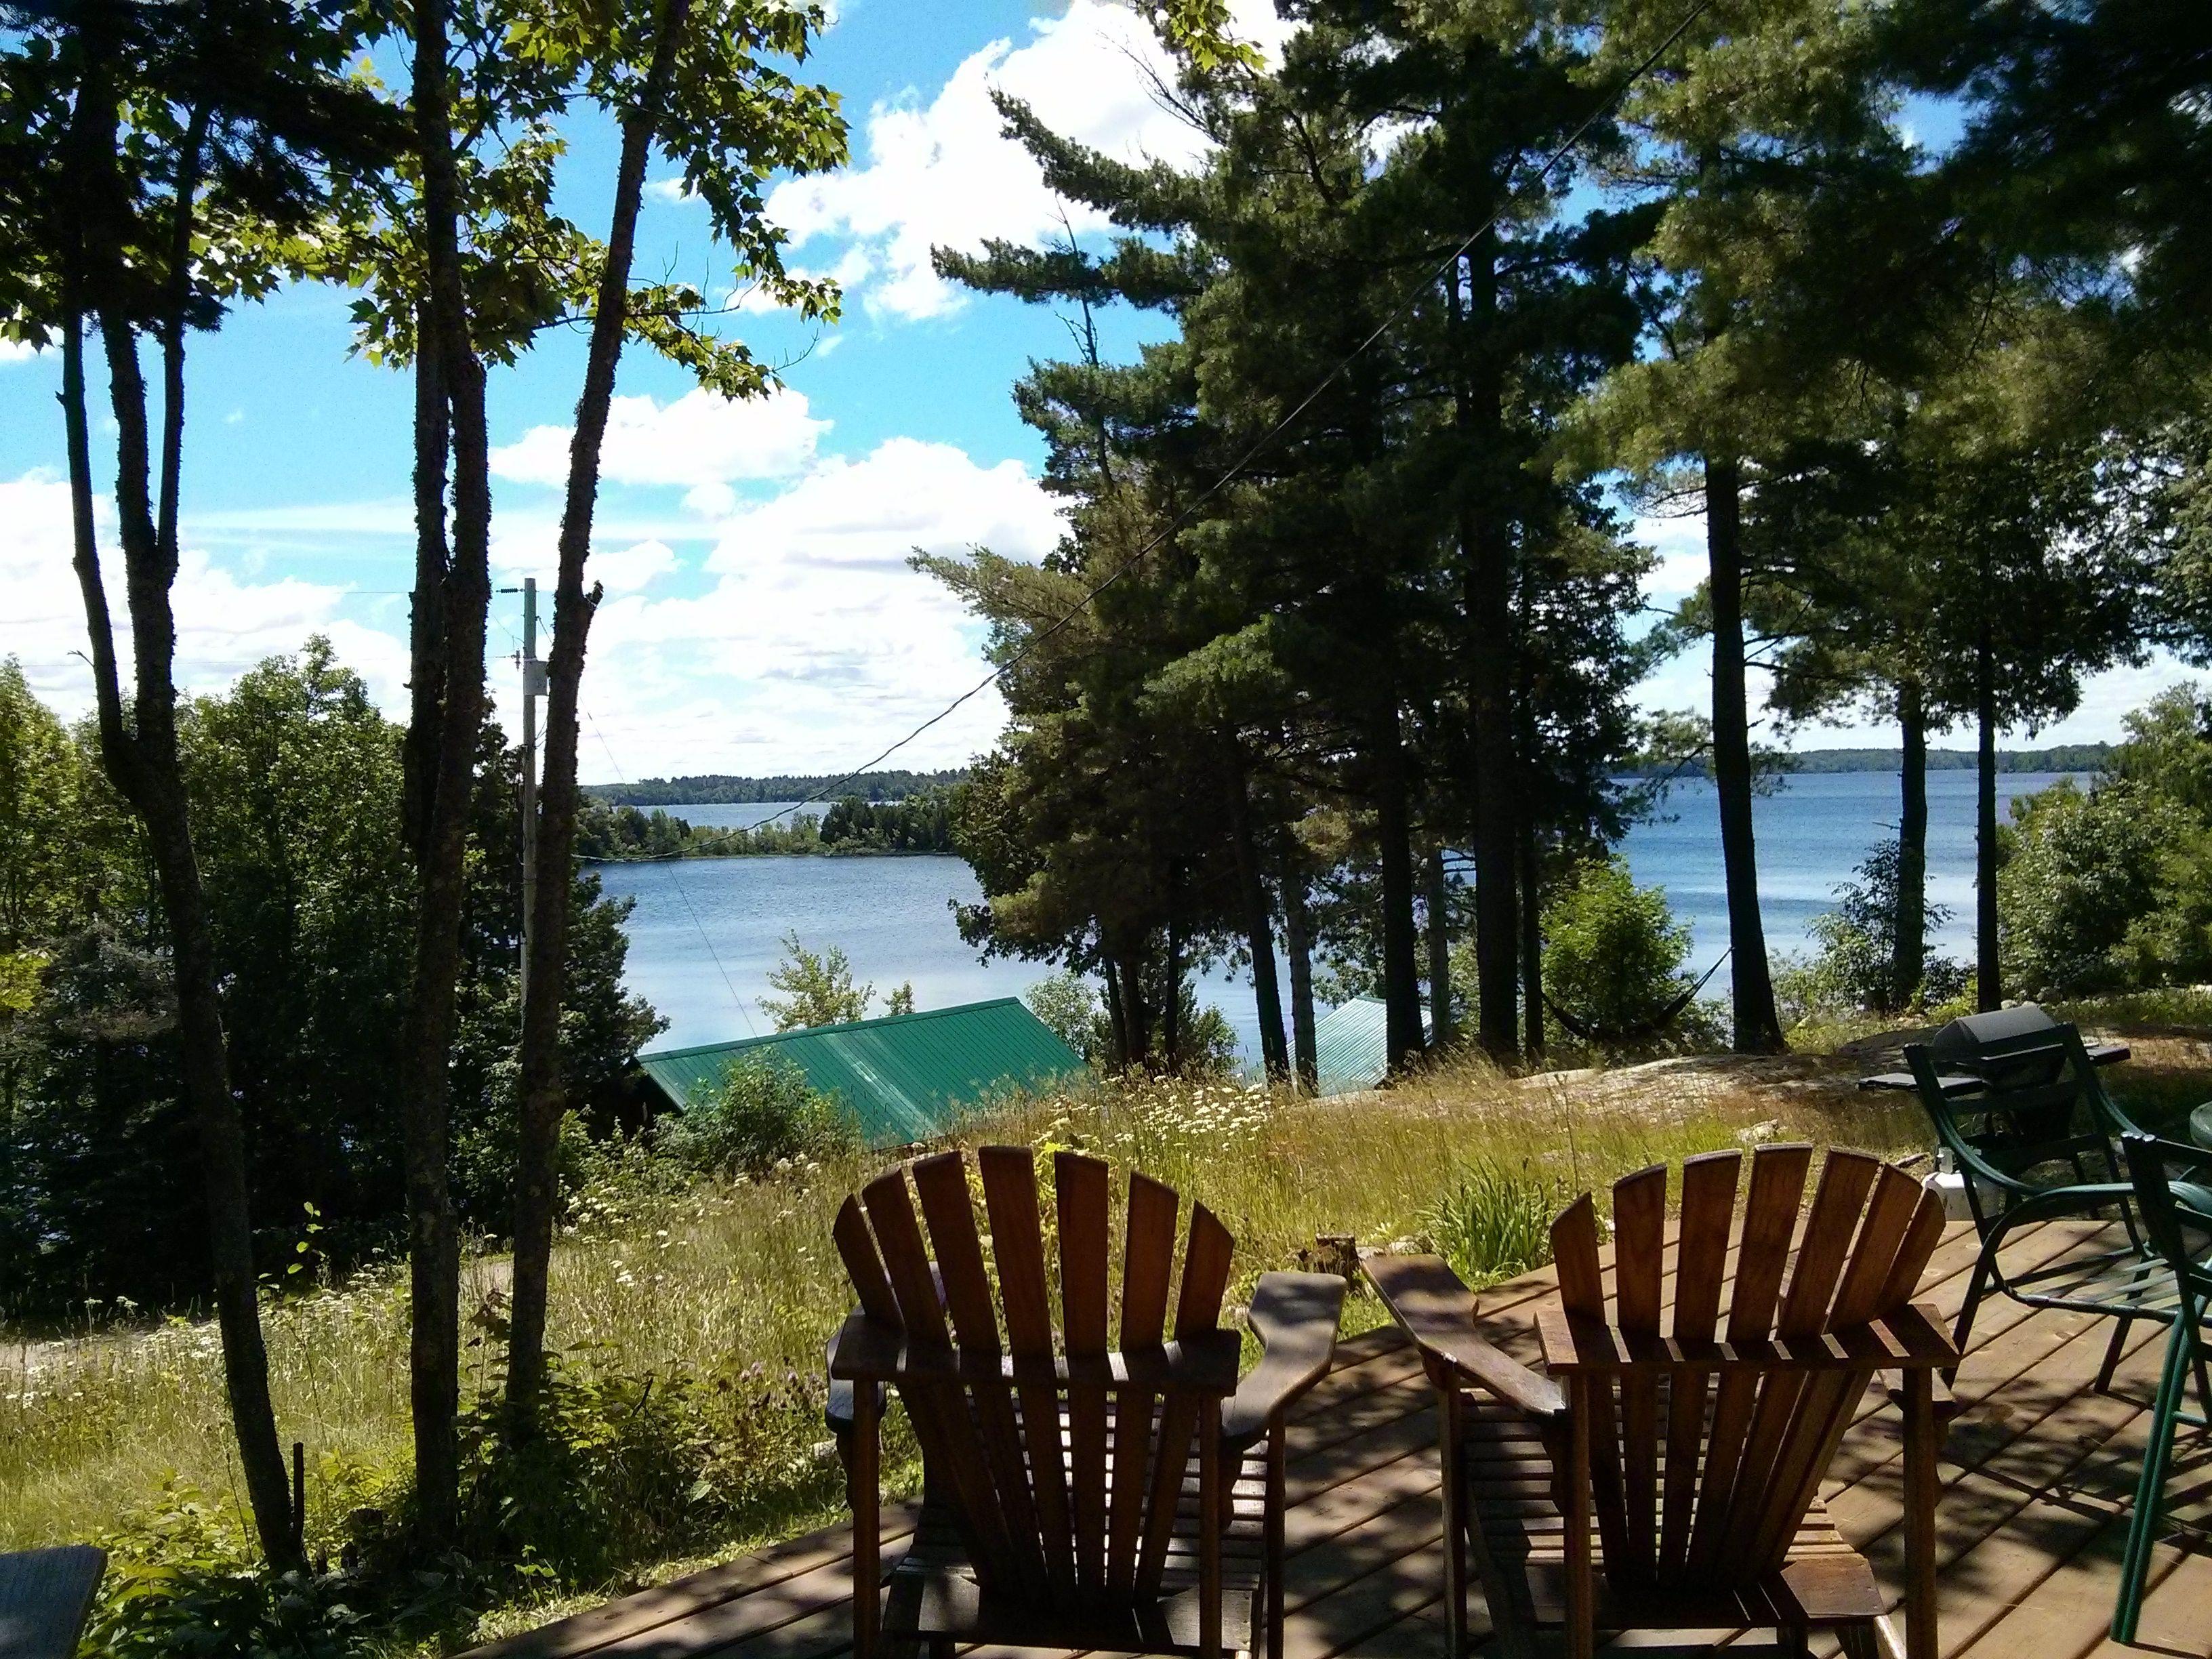 Minnesota Lake Cabins for Rent Lake cabins, Fishing